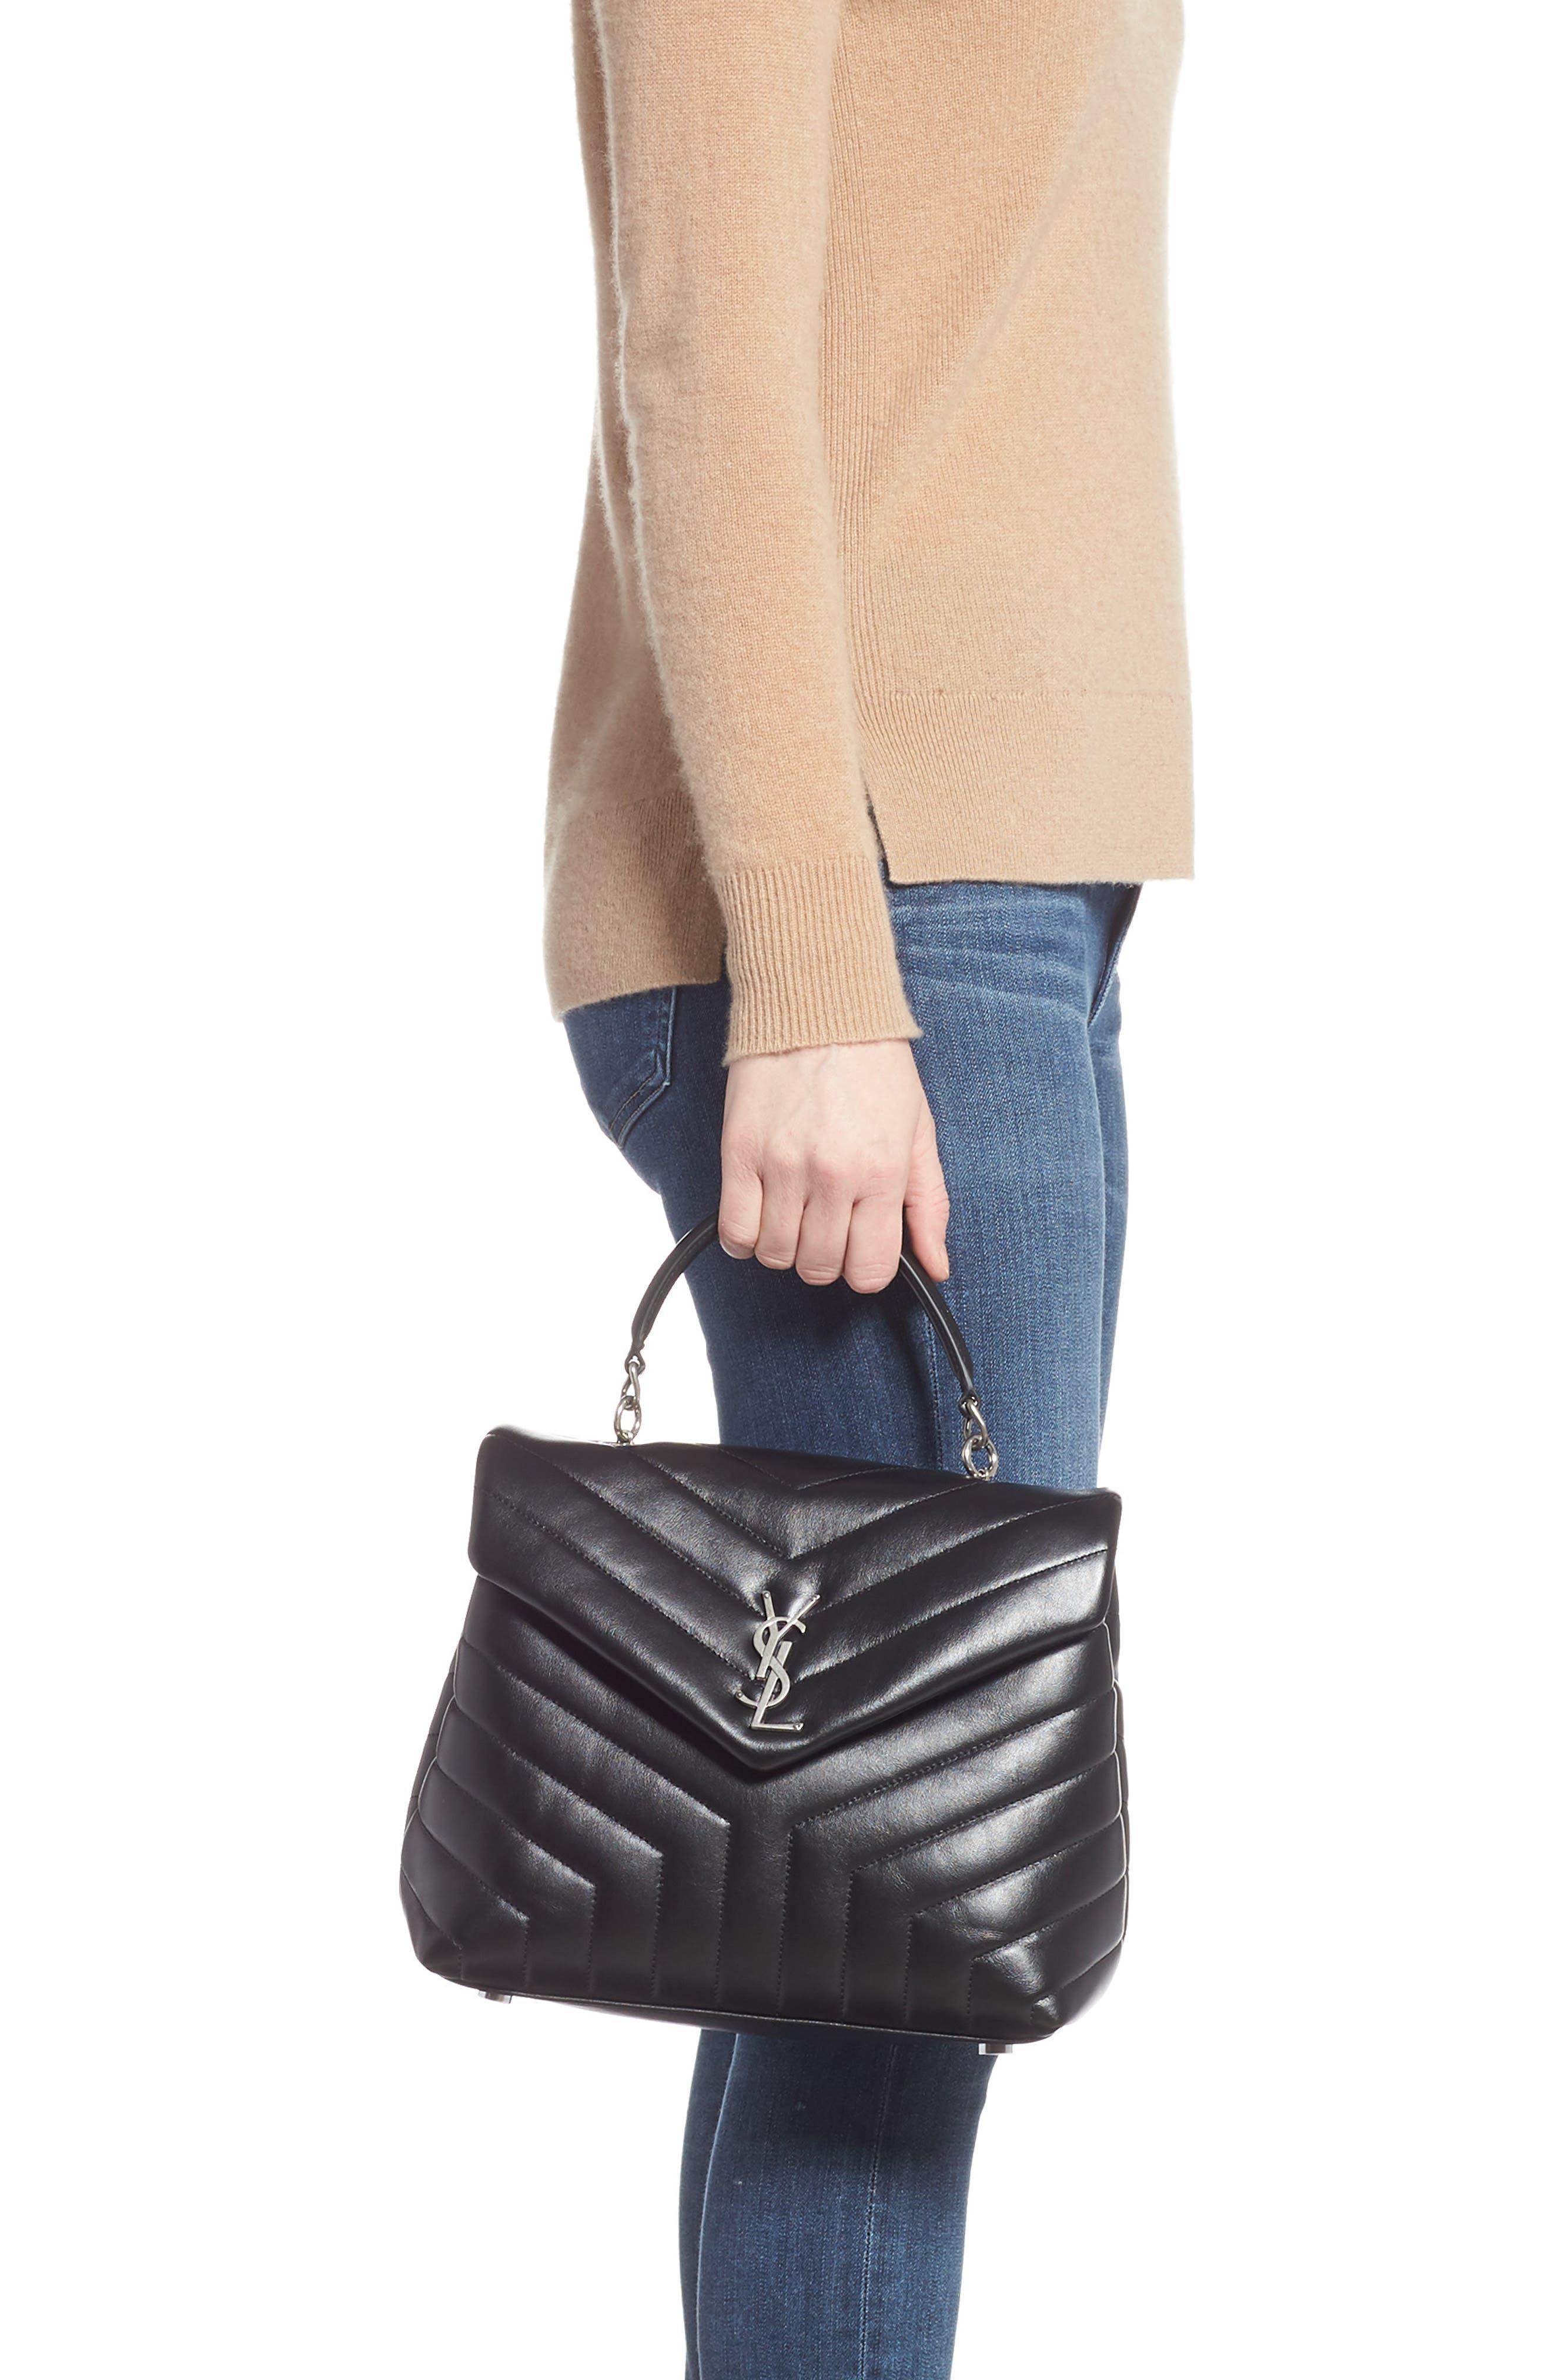 Loulou Leather Top Handle Satchel,                             Alternate thumbnail 2, color,                             NERO/ NERO